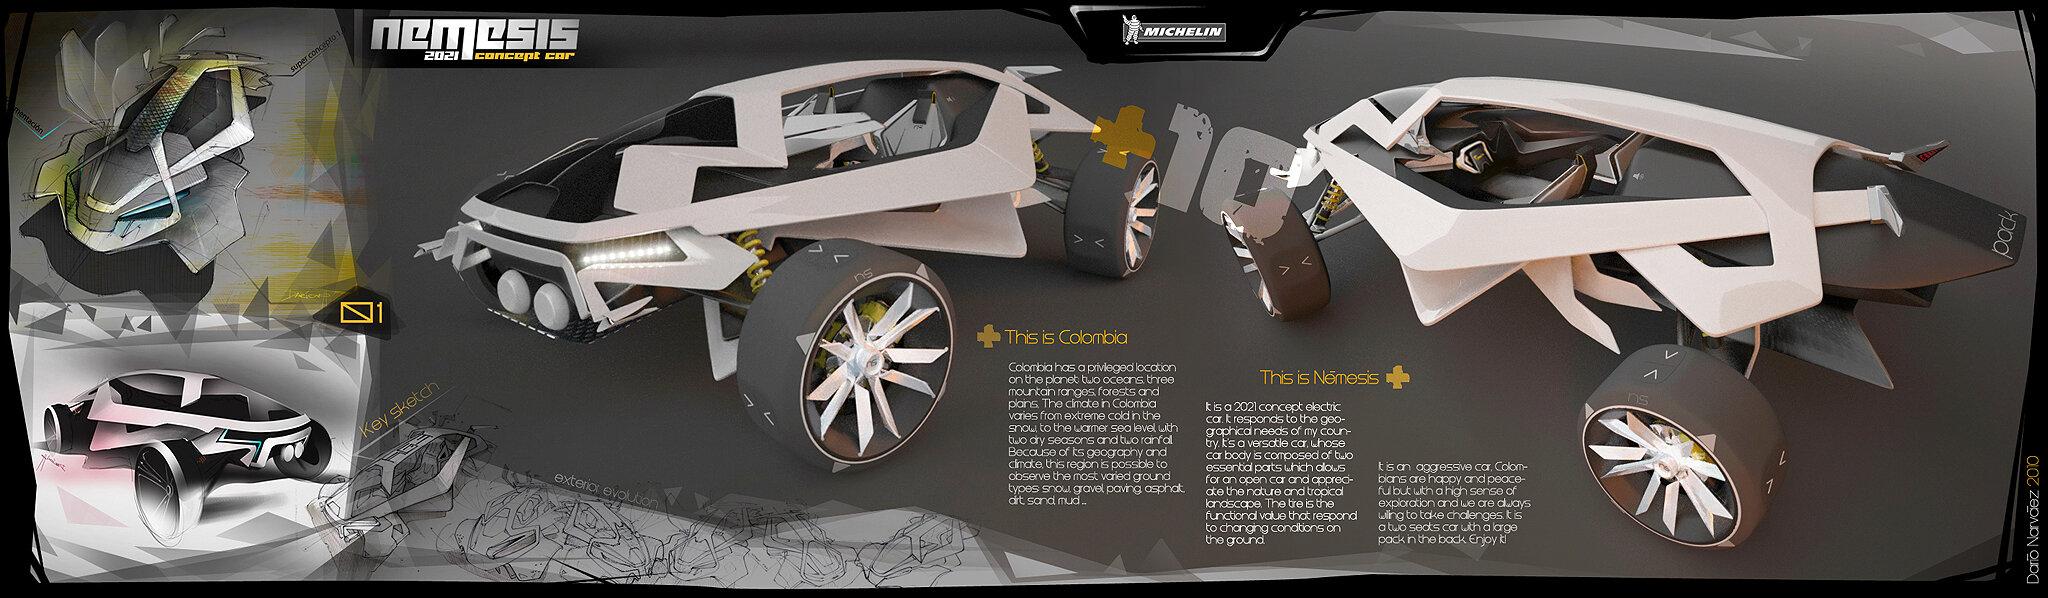 Nemesis_concept_car_final_02_source.jpg